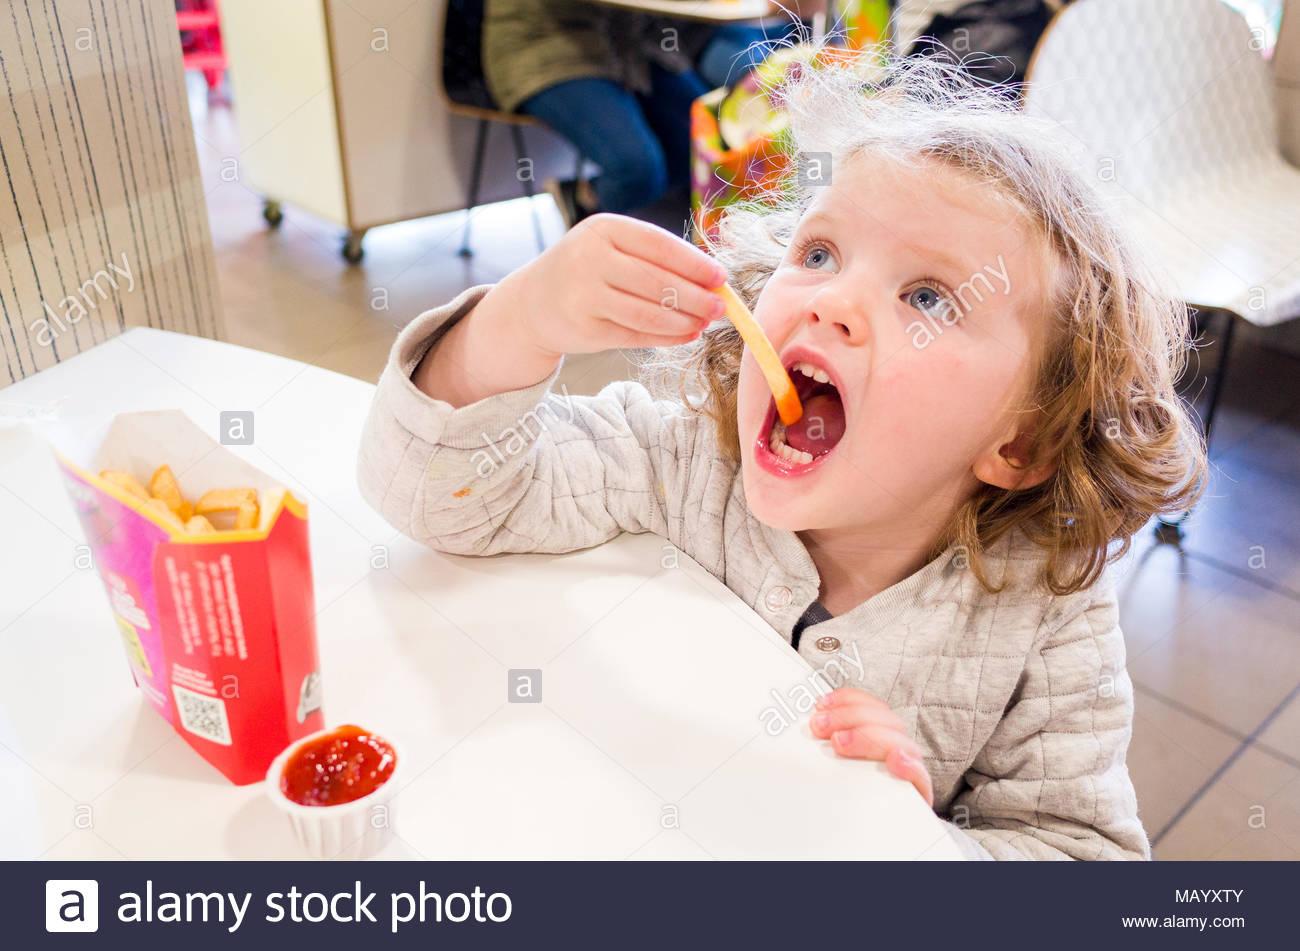 Toddler eating McDonald's french fries, UK - Stock Image